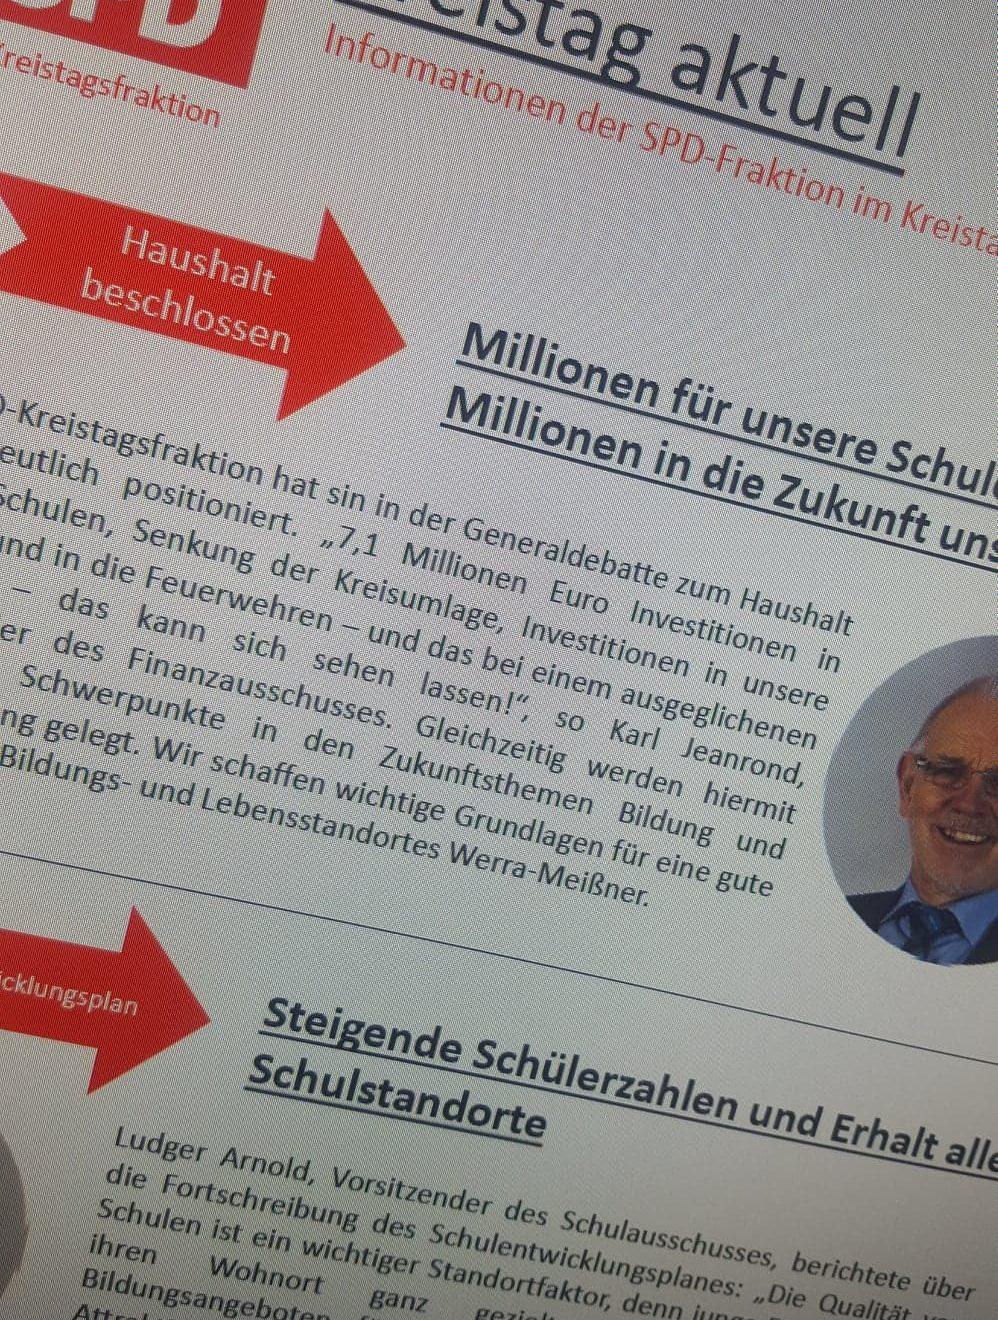 SPD_aktuell